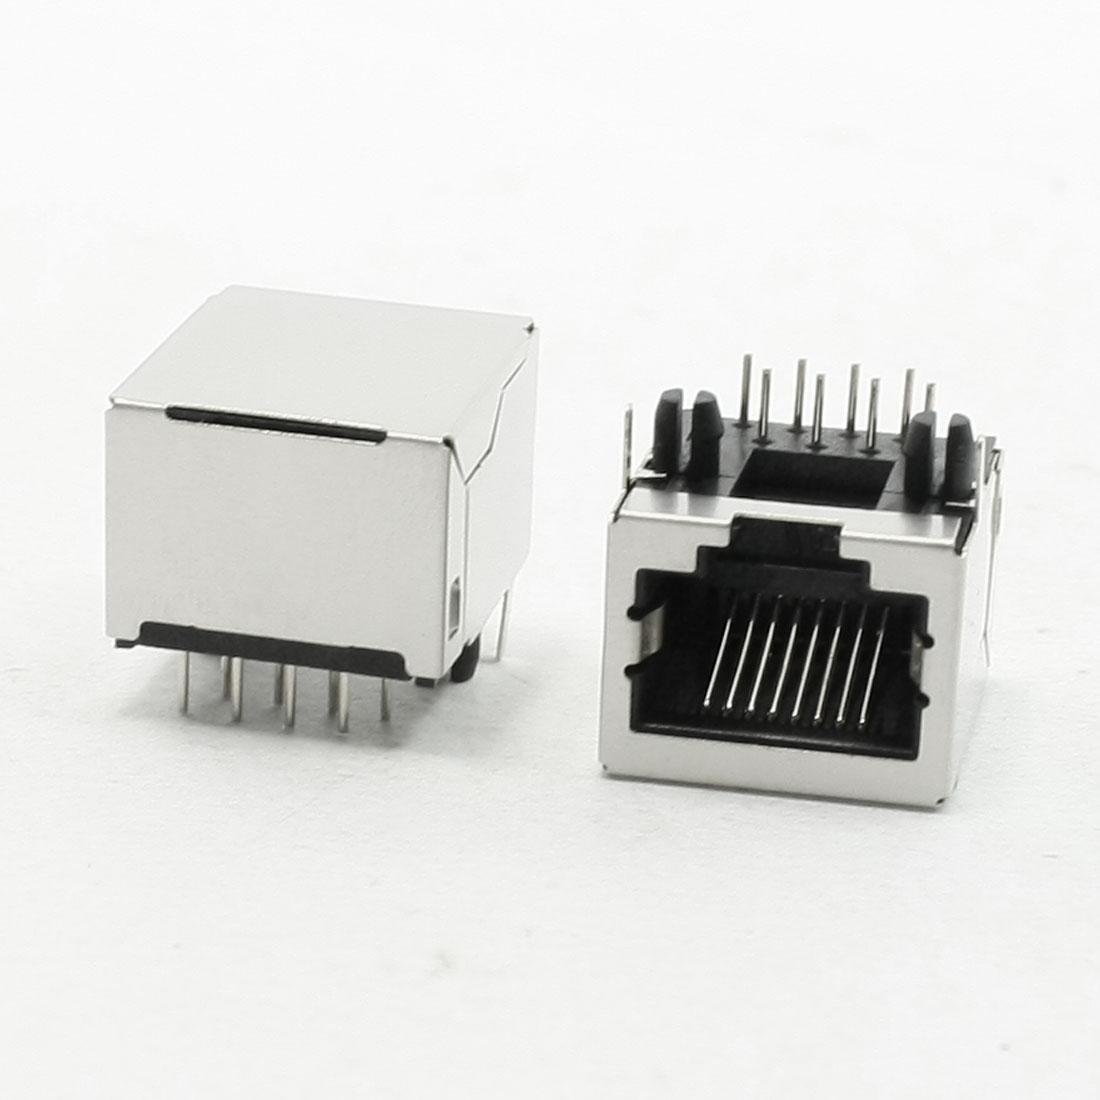 "10Pcs Stainless Steel Shield 8P8C RJ45 PCB Jack Connector Port 0.7"" Long"